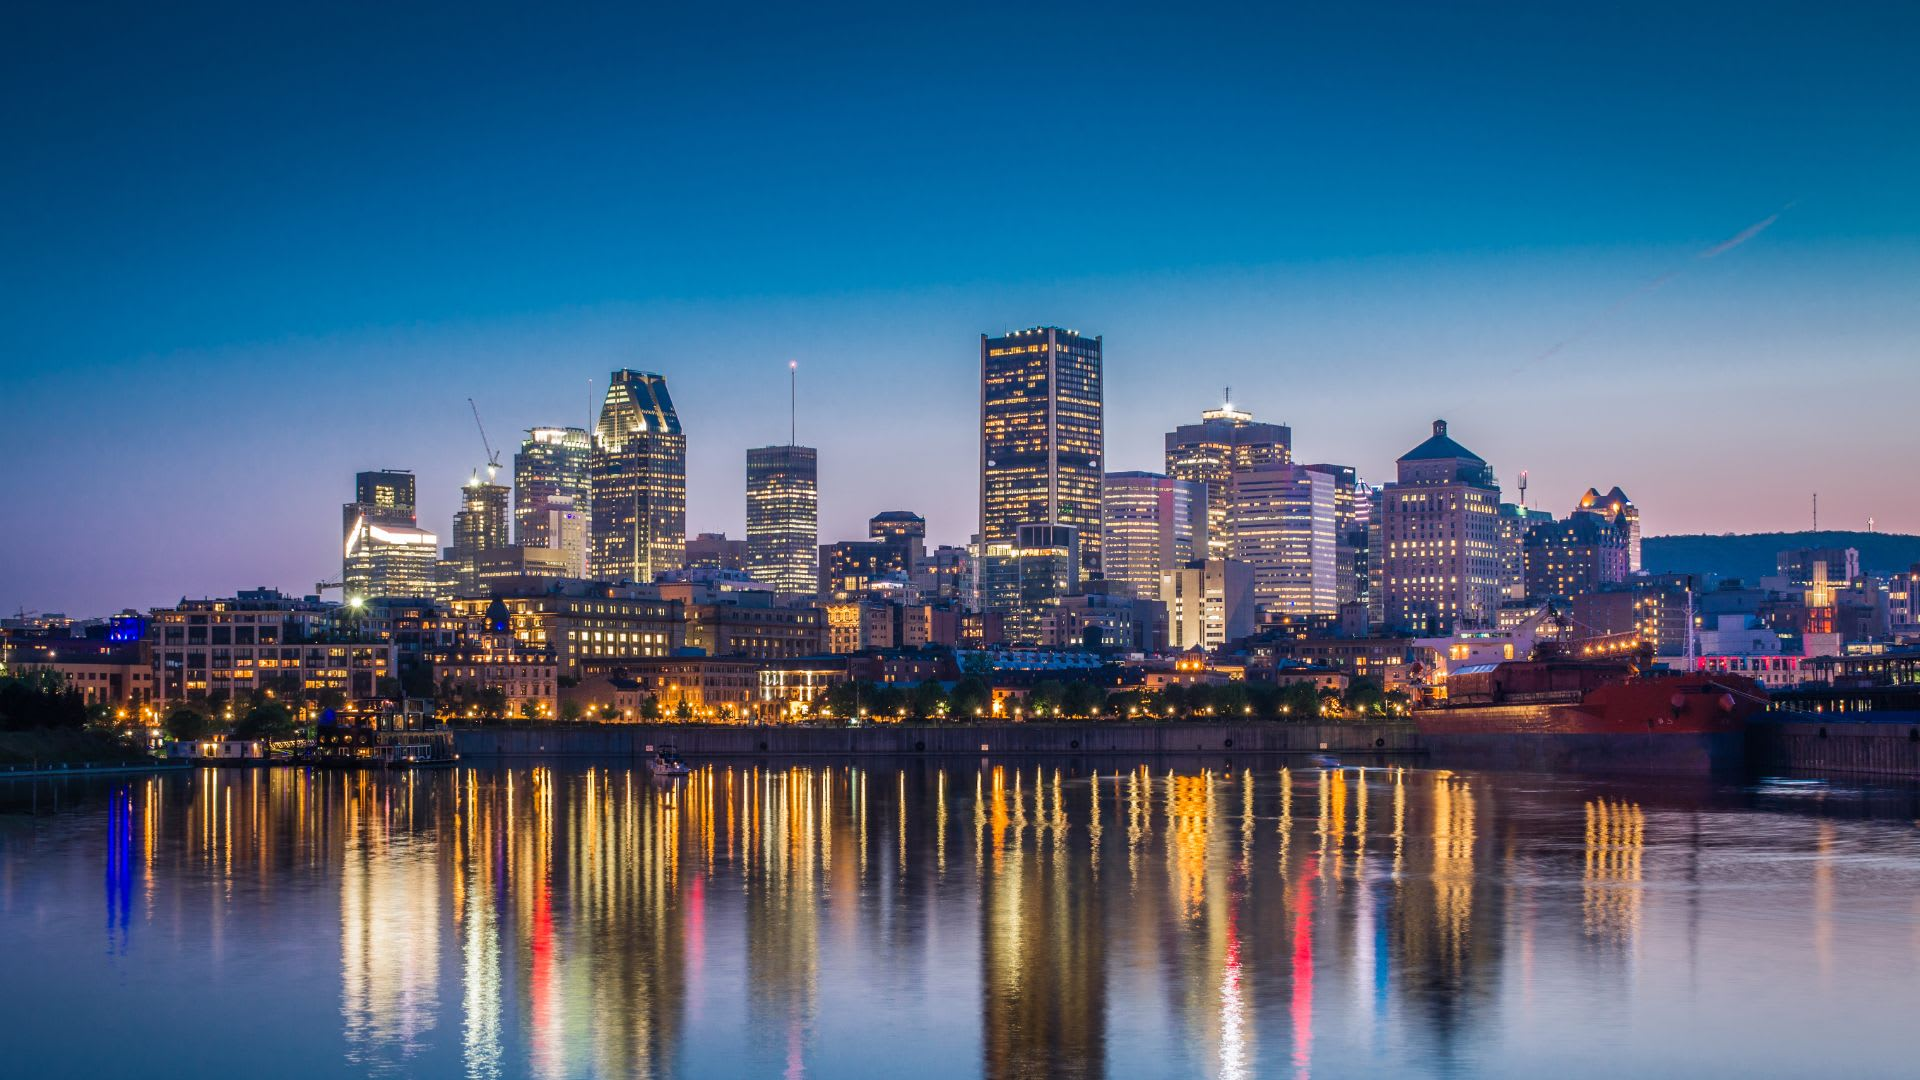 Montreal image